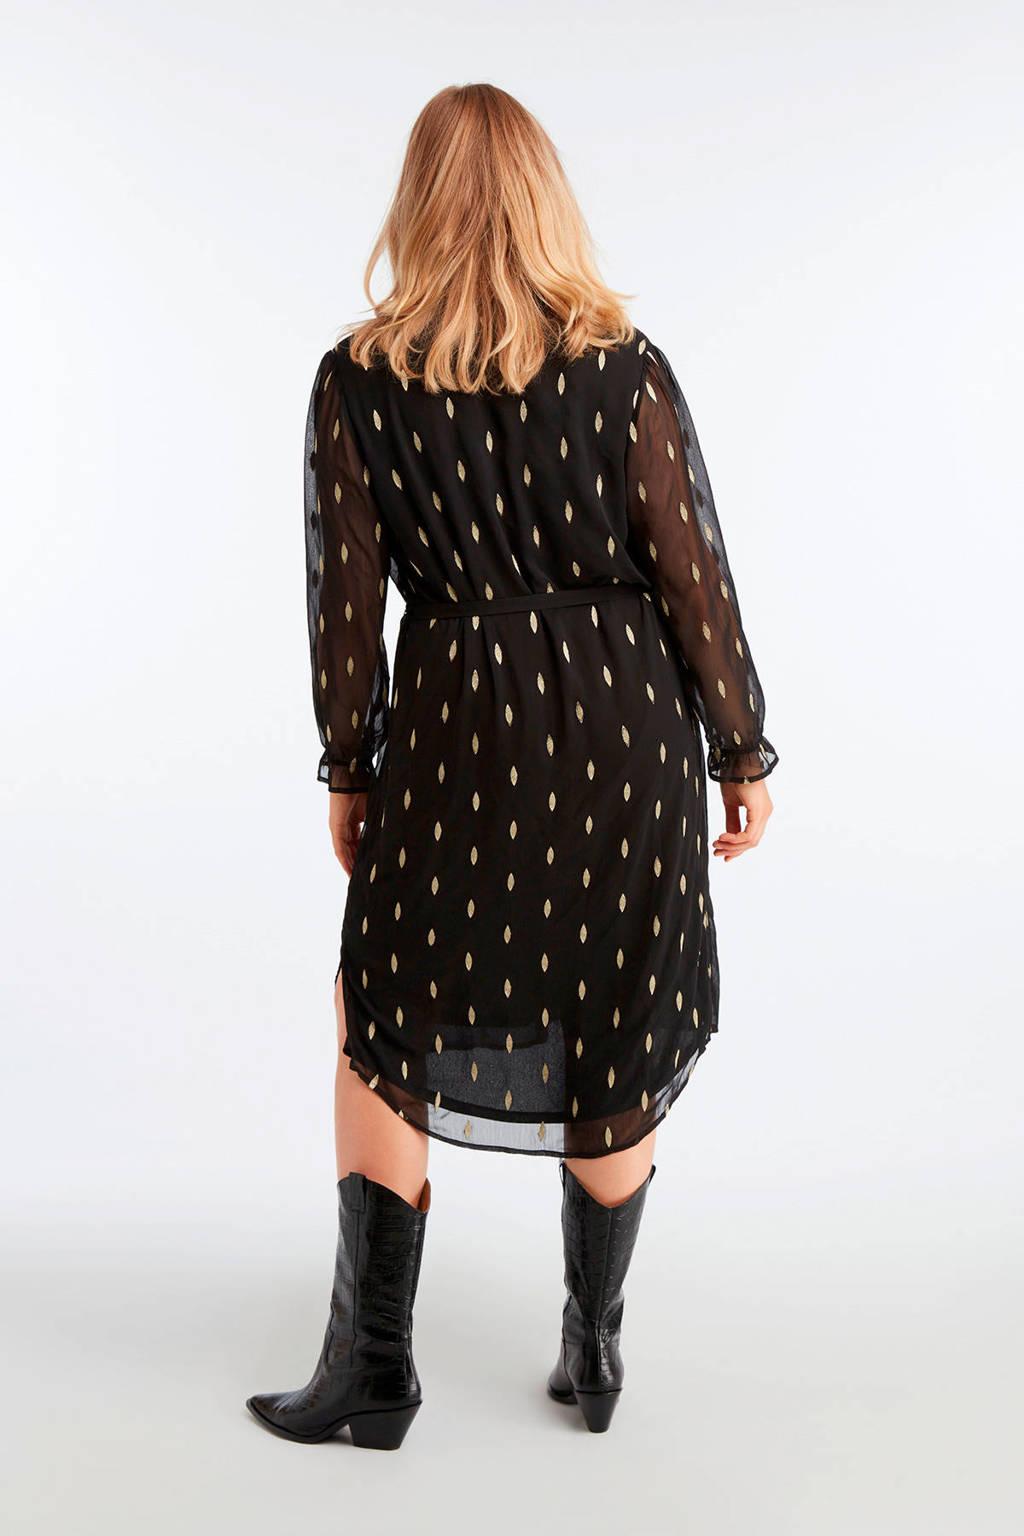 MS Mode semi-transparante jurk met all over print en ceintuur zwart/goud, Zwart/goud